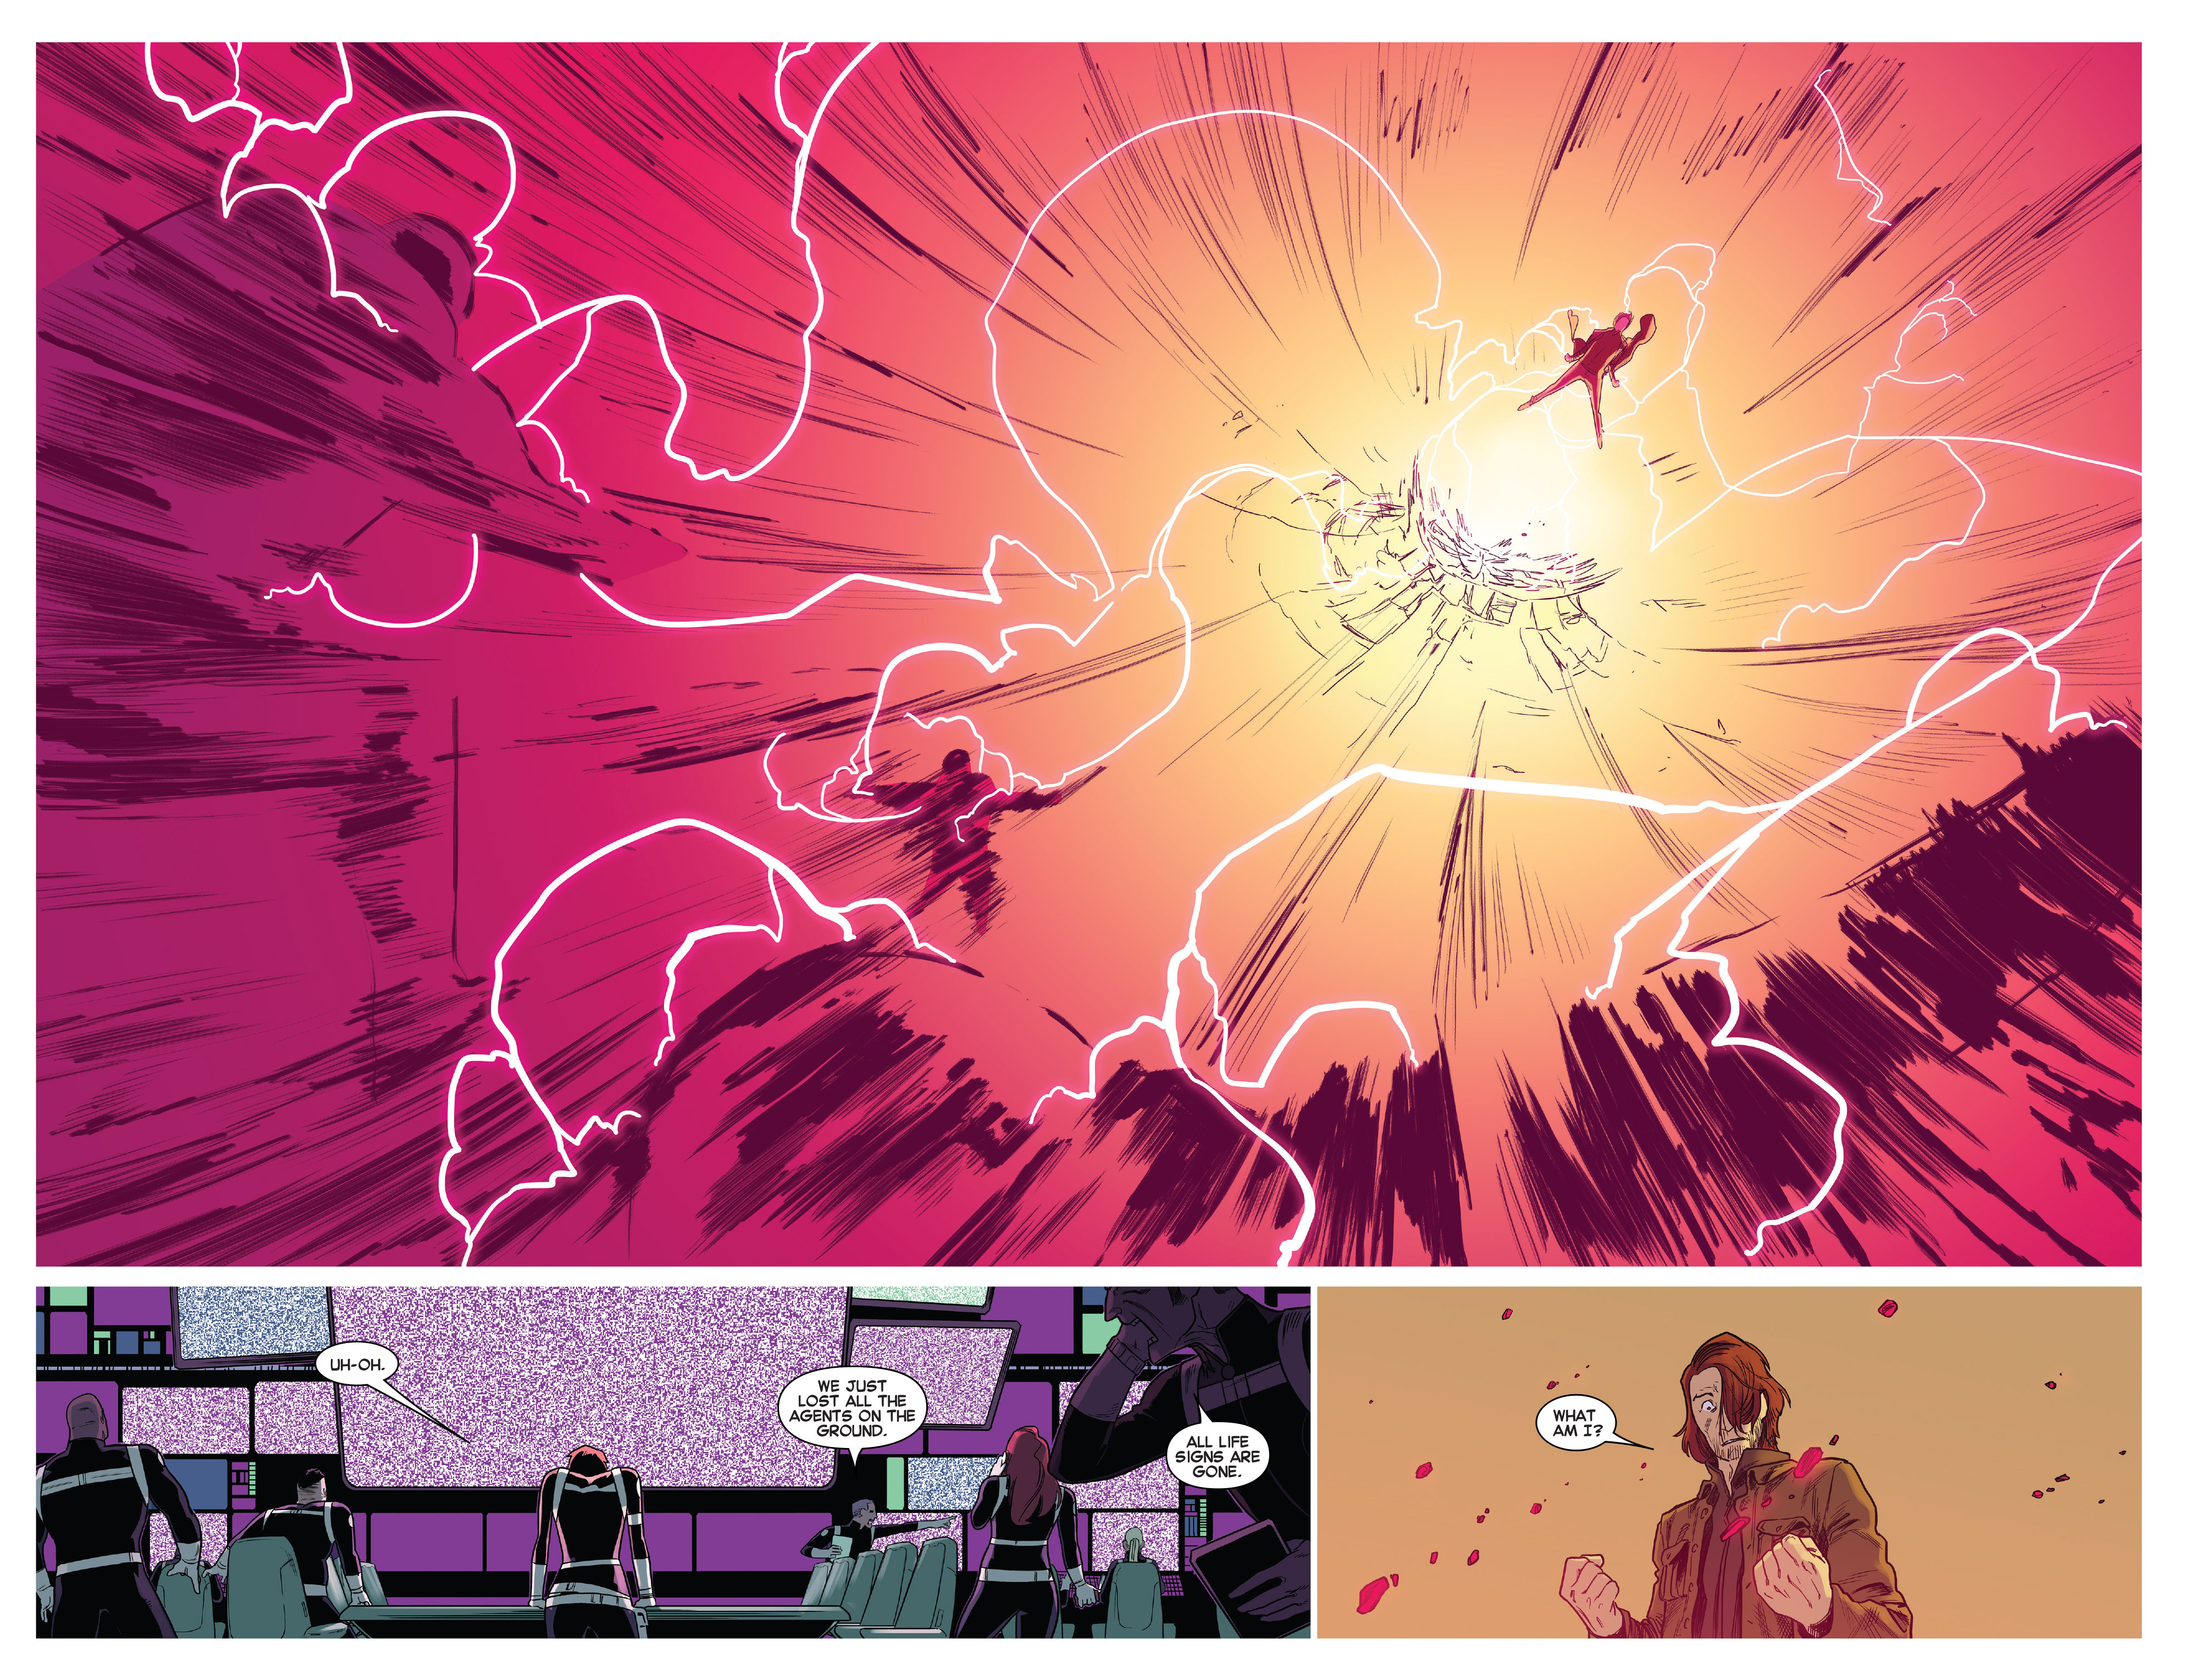 Read online Uncanny X-Men (2013) comic -  Issue # _TPB 4 - vs. S.H.I.E.L.D - 111